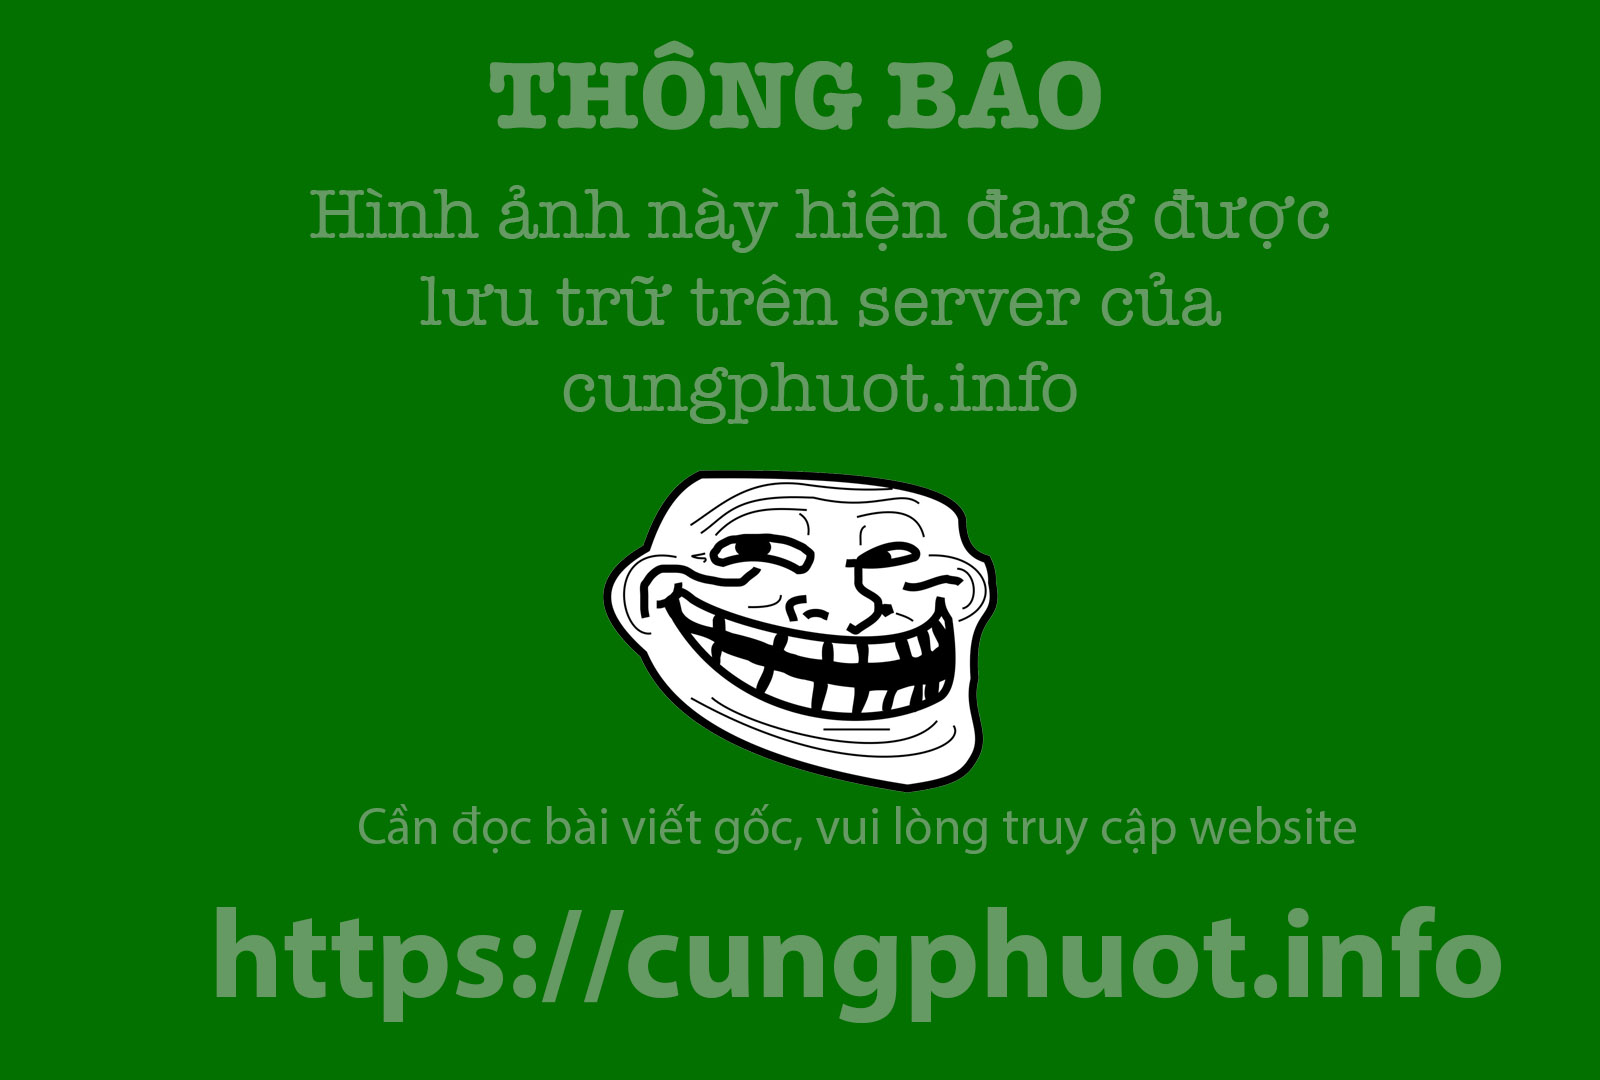 Co do Lam Kinh nhin tu tren cao hinh anh 6